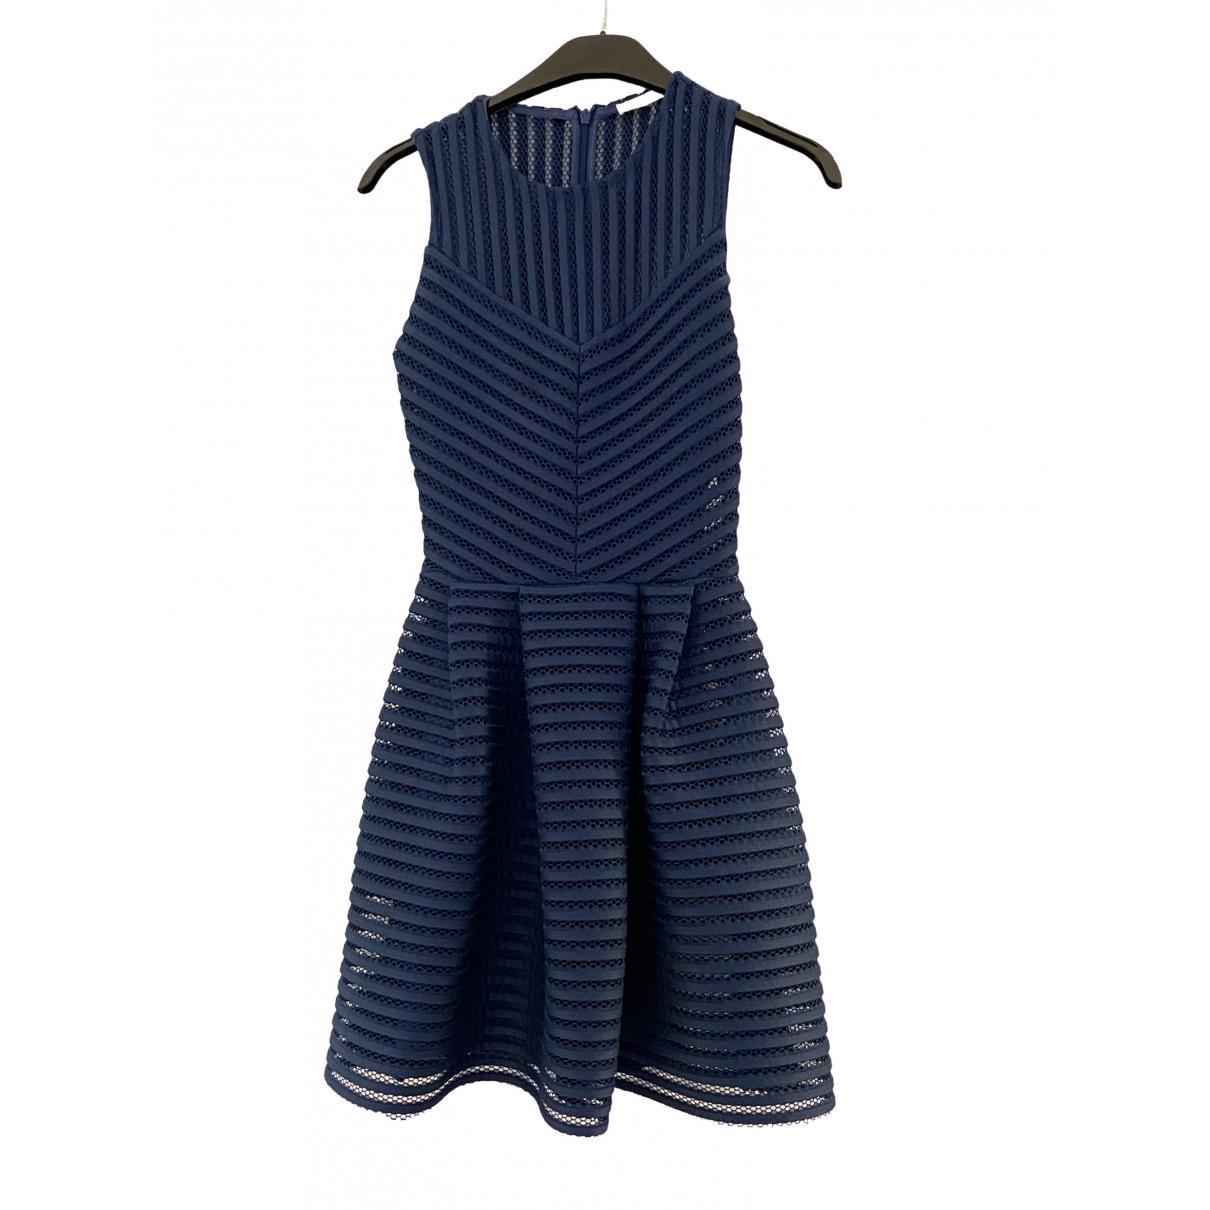 Maje Spring Summer 2019 Blue dress for Women 36 FR